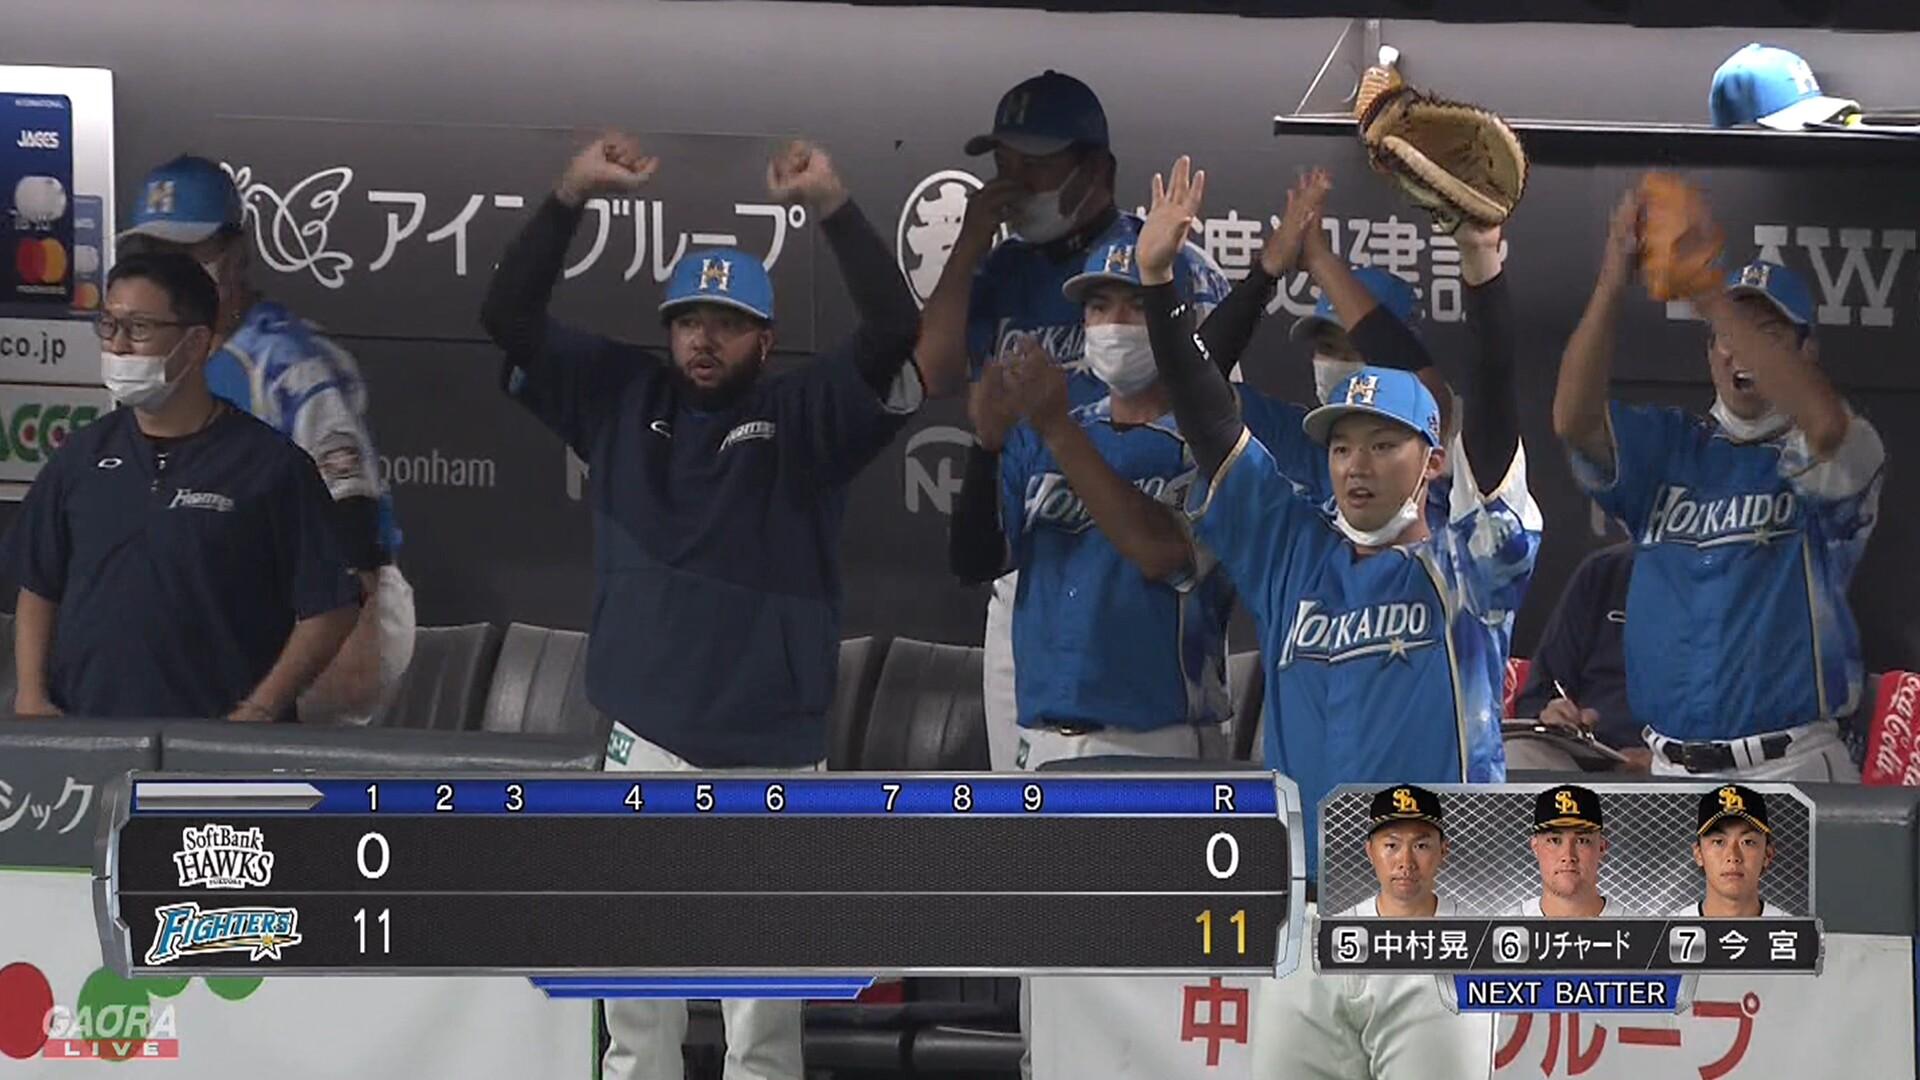 日本ハム、初回に11得点wwwwwwwwwww